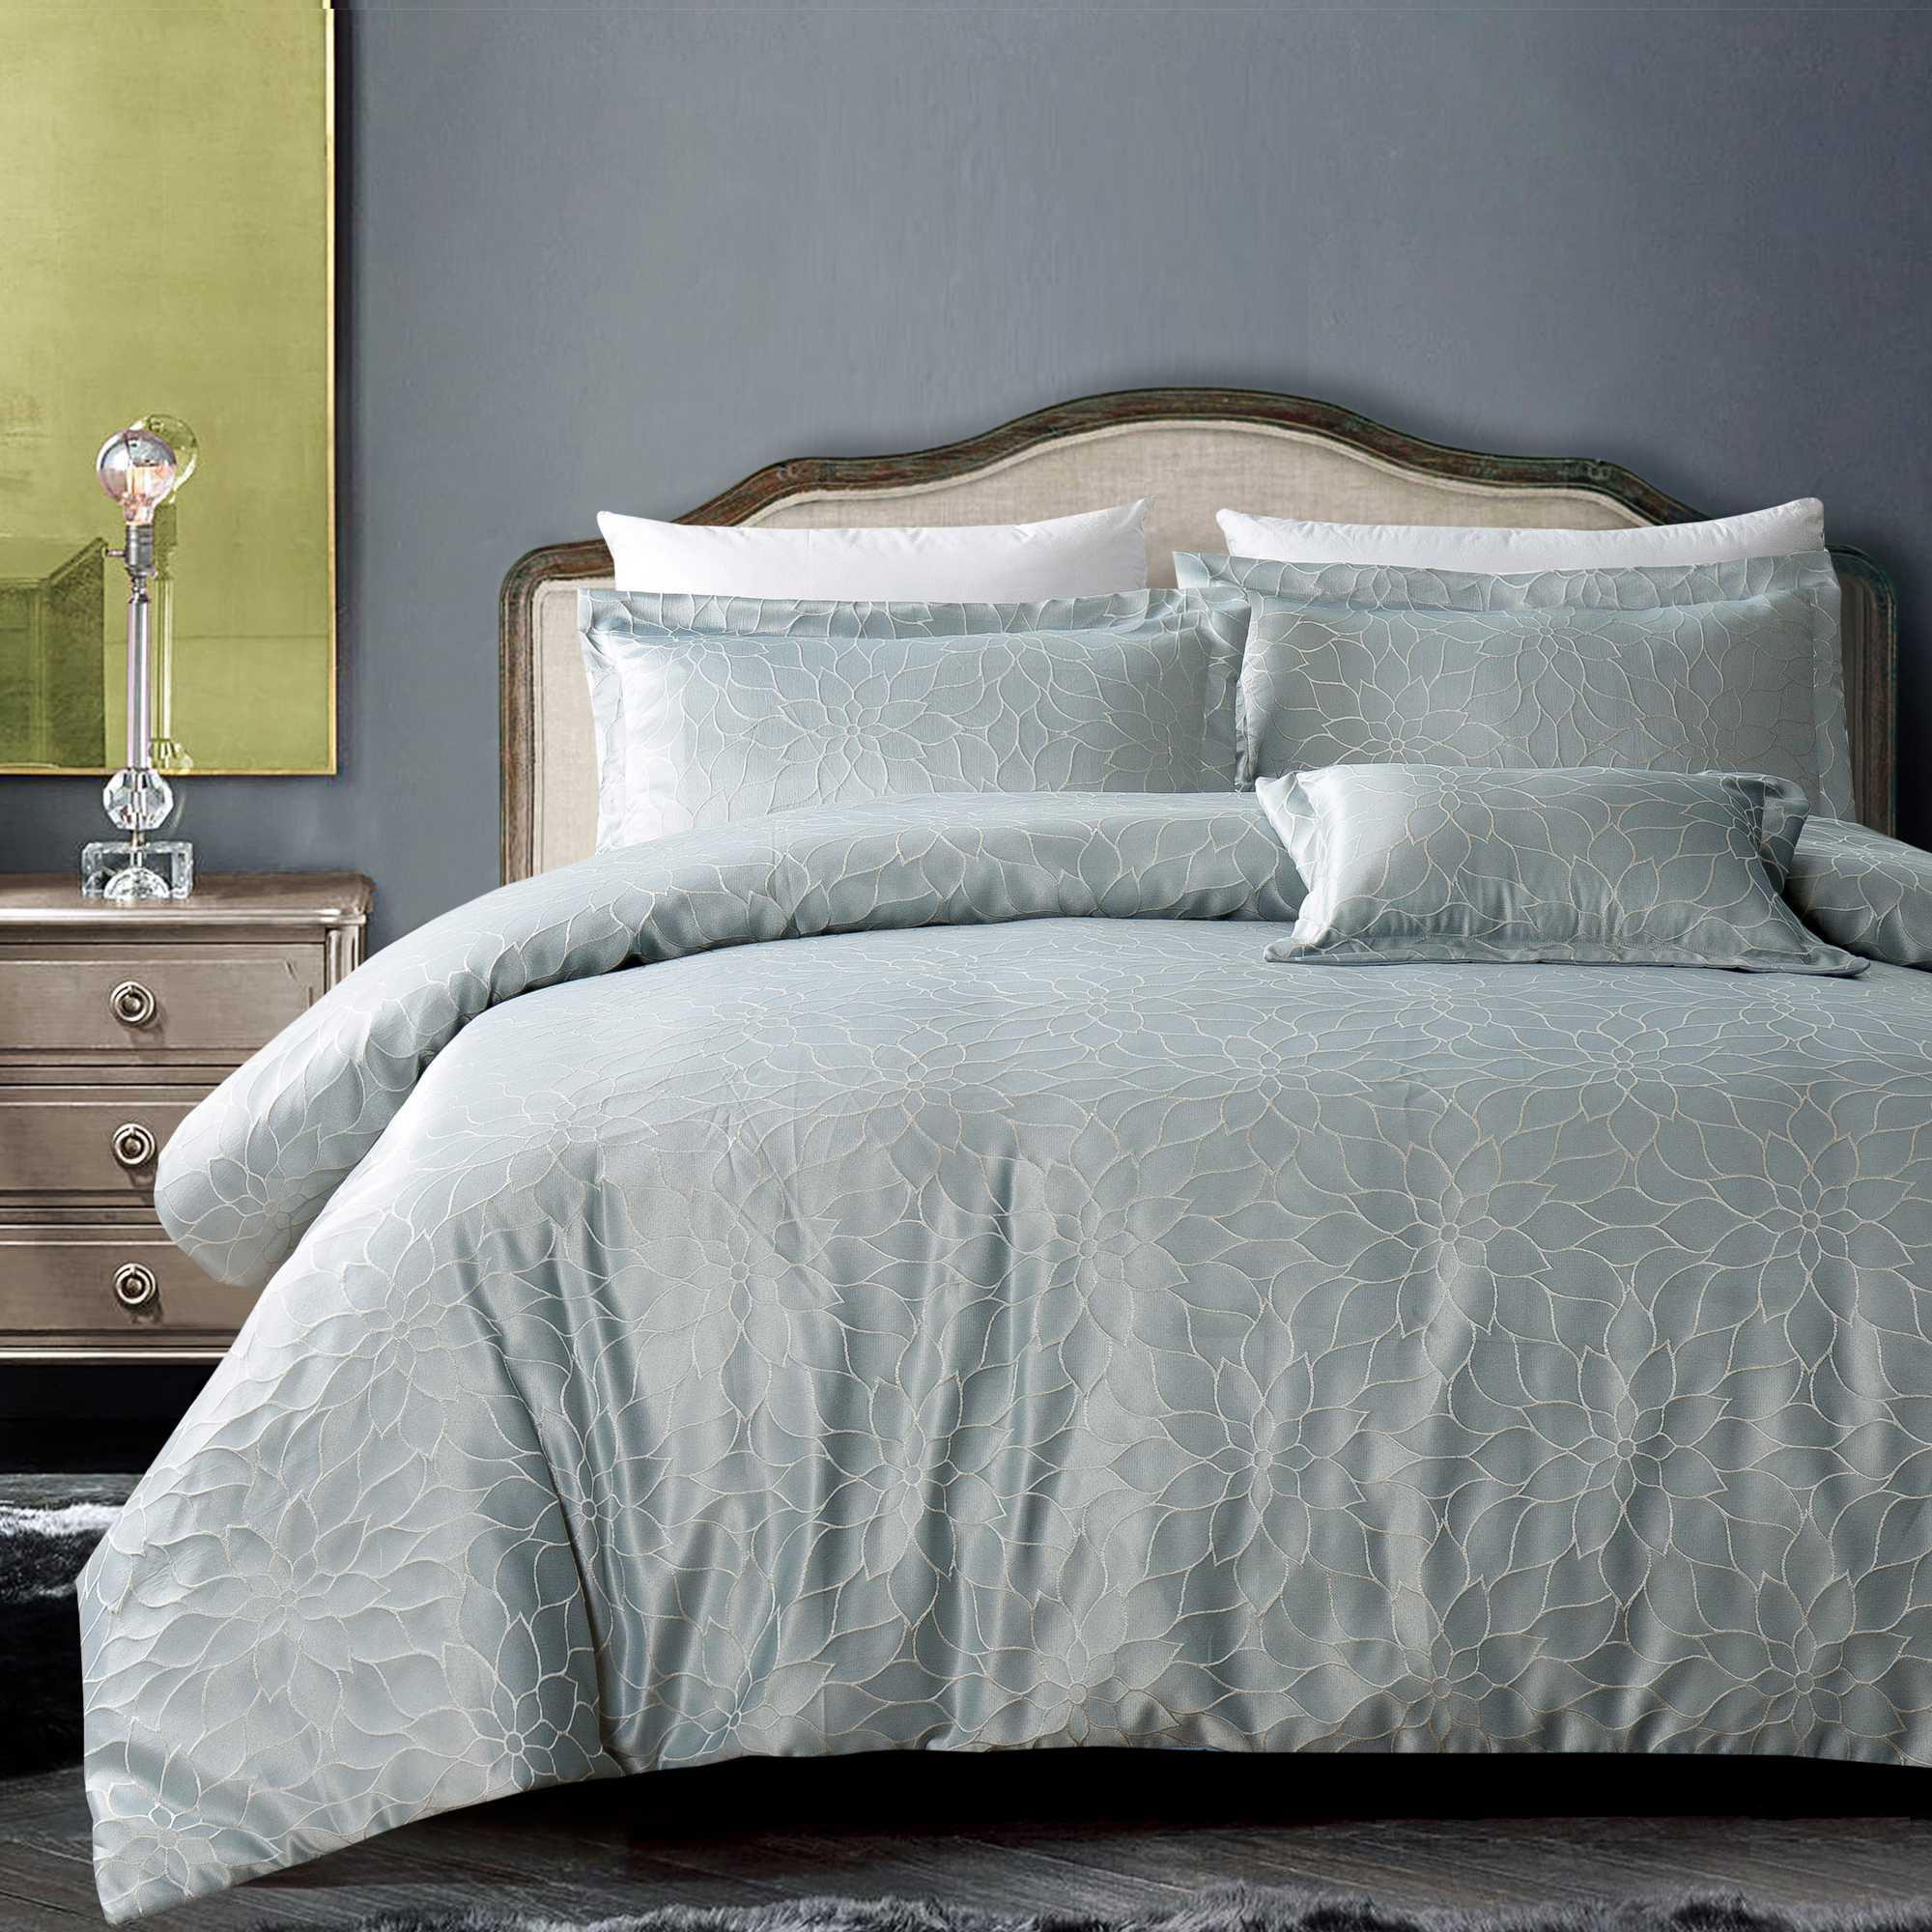 California Design Den Hotel Royal Bloom Down Alternative Comforter Set Silver Gray, King 4 Piece